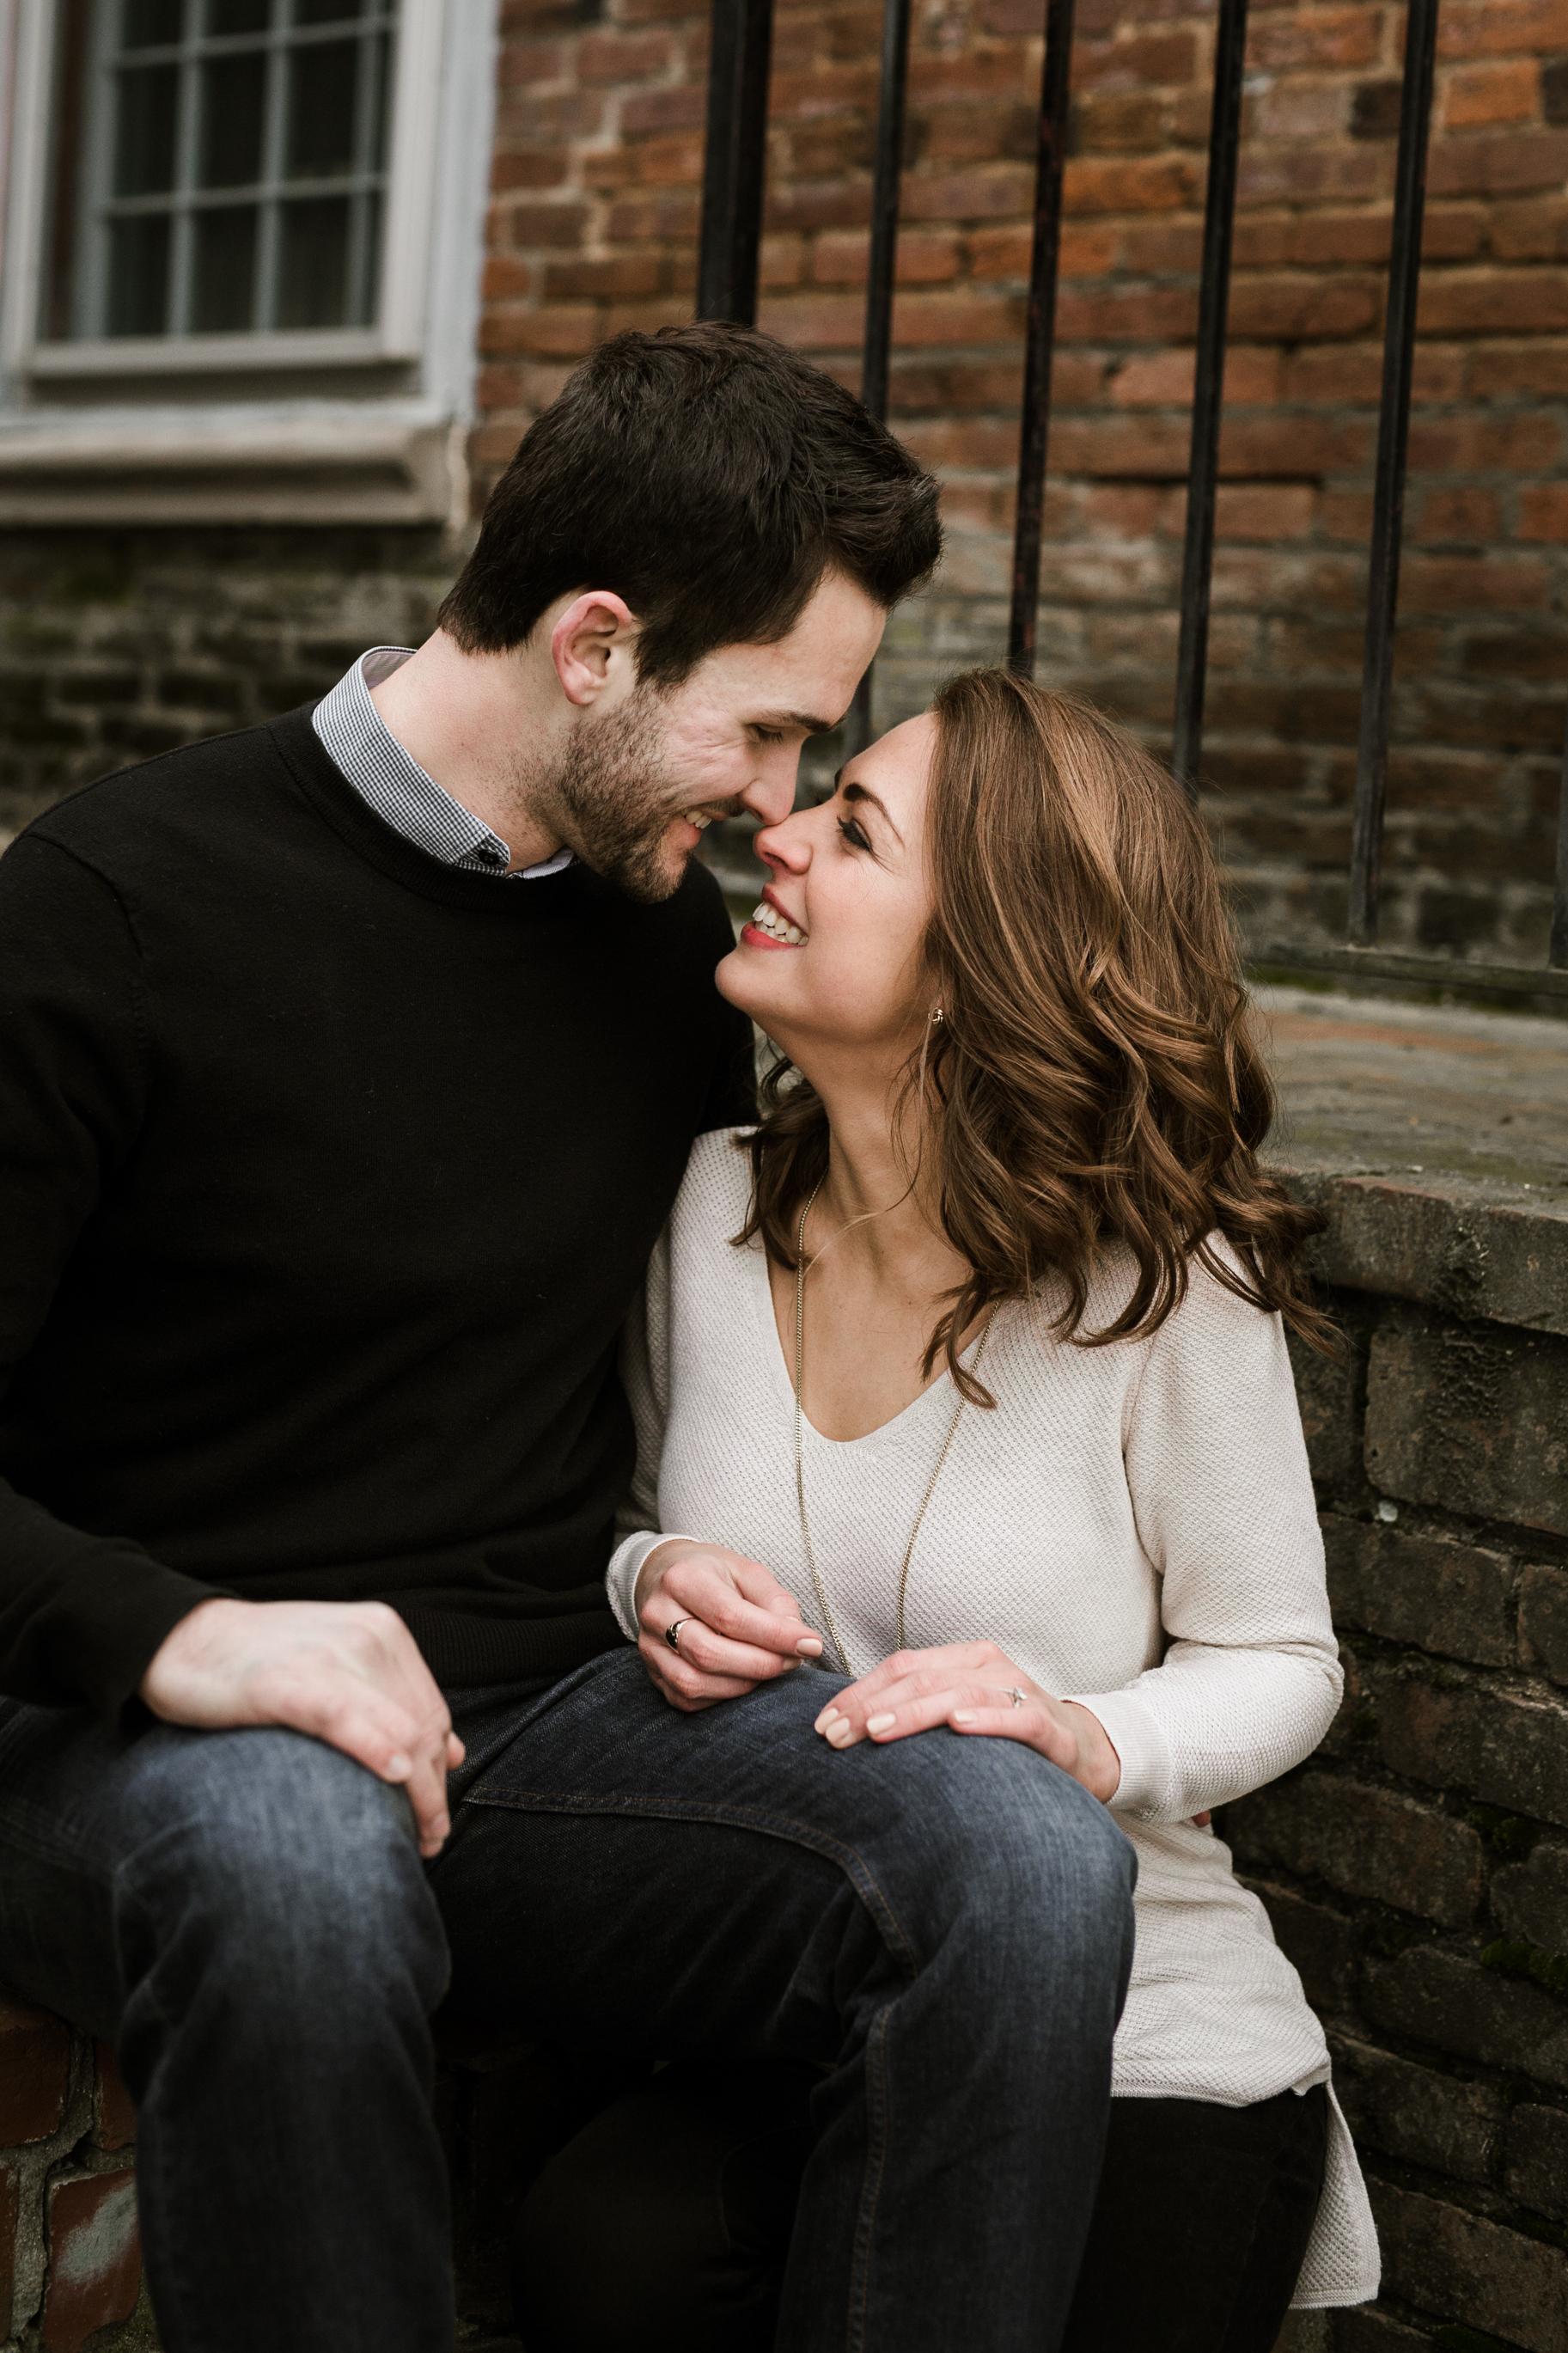 Ellen & Lee Engagement 2018 WEBSITE SP Crystal Ludwick Photo (16 of 54).jpg